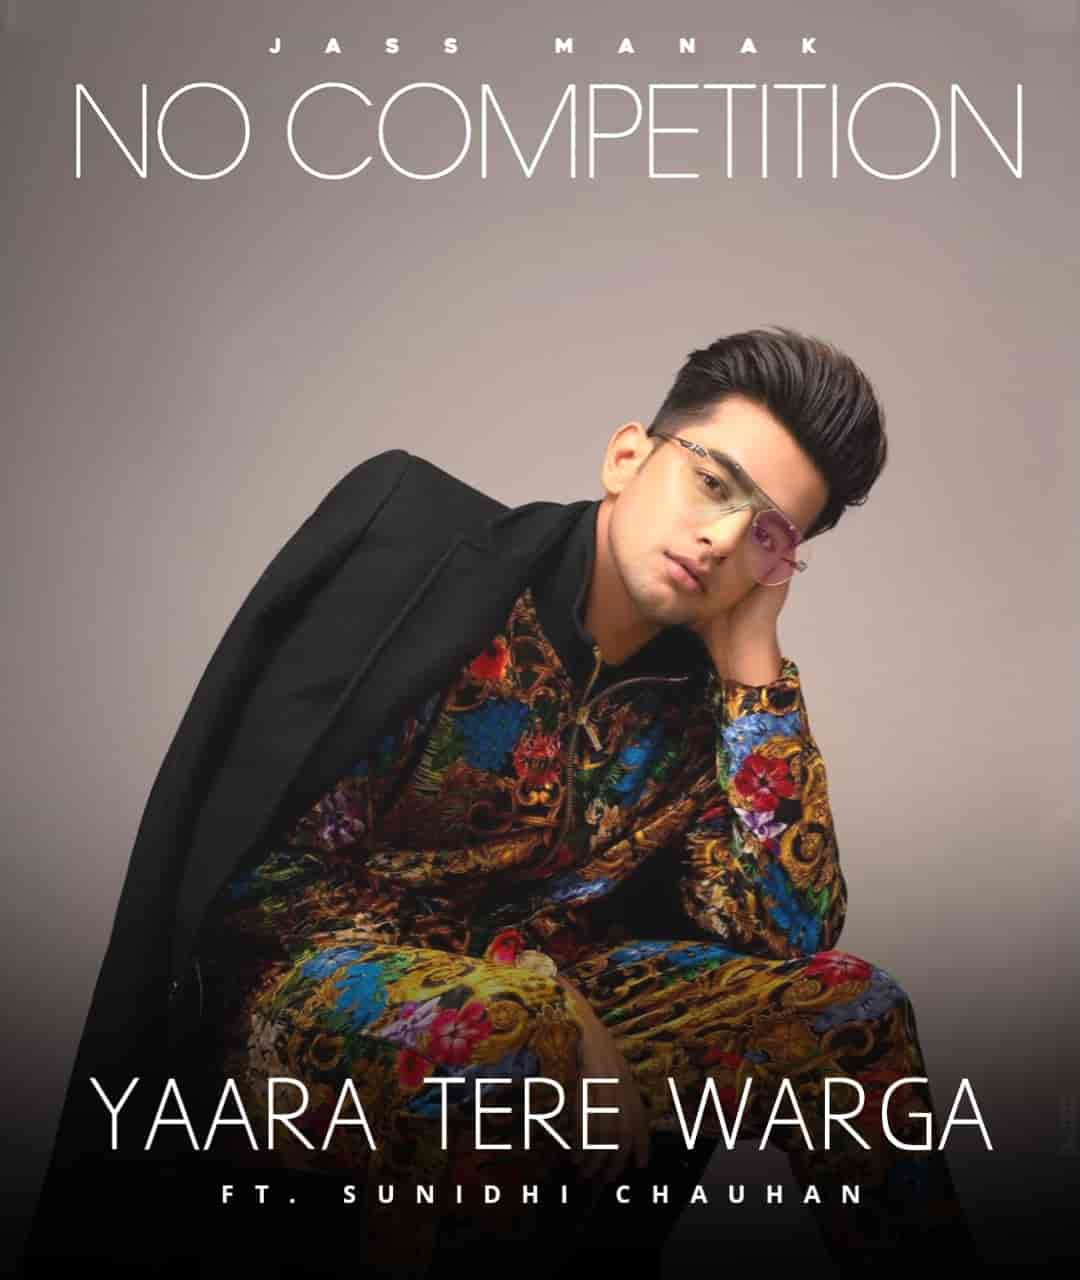 Yaara Tere Warga Punjabi Song Image From Album No Competition Of Jass Manak